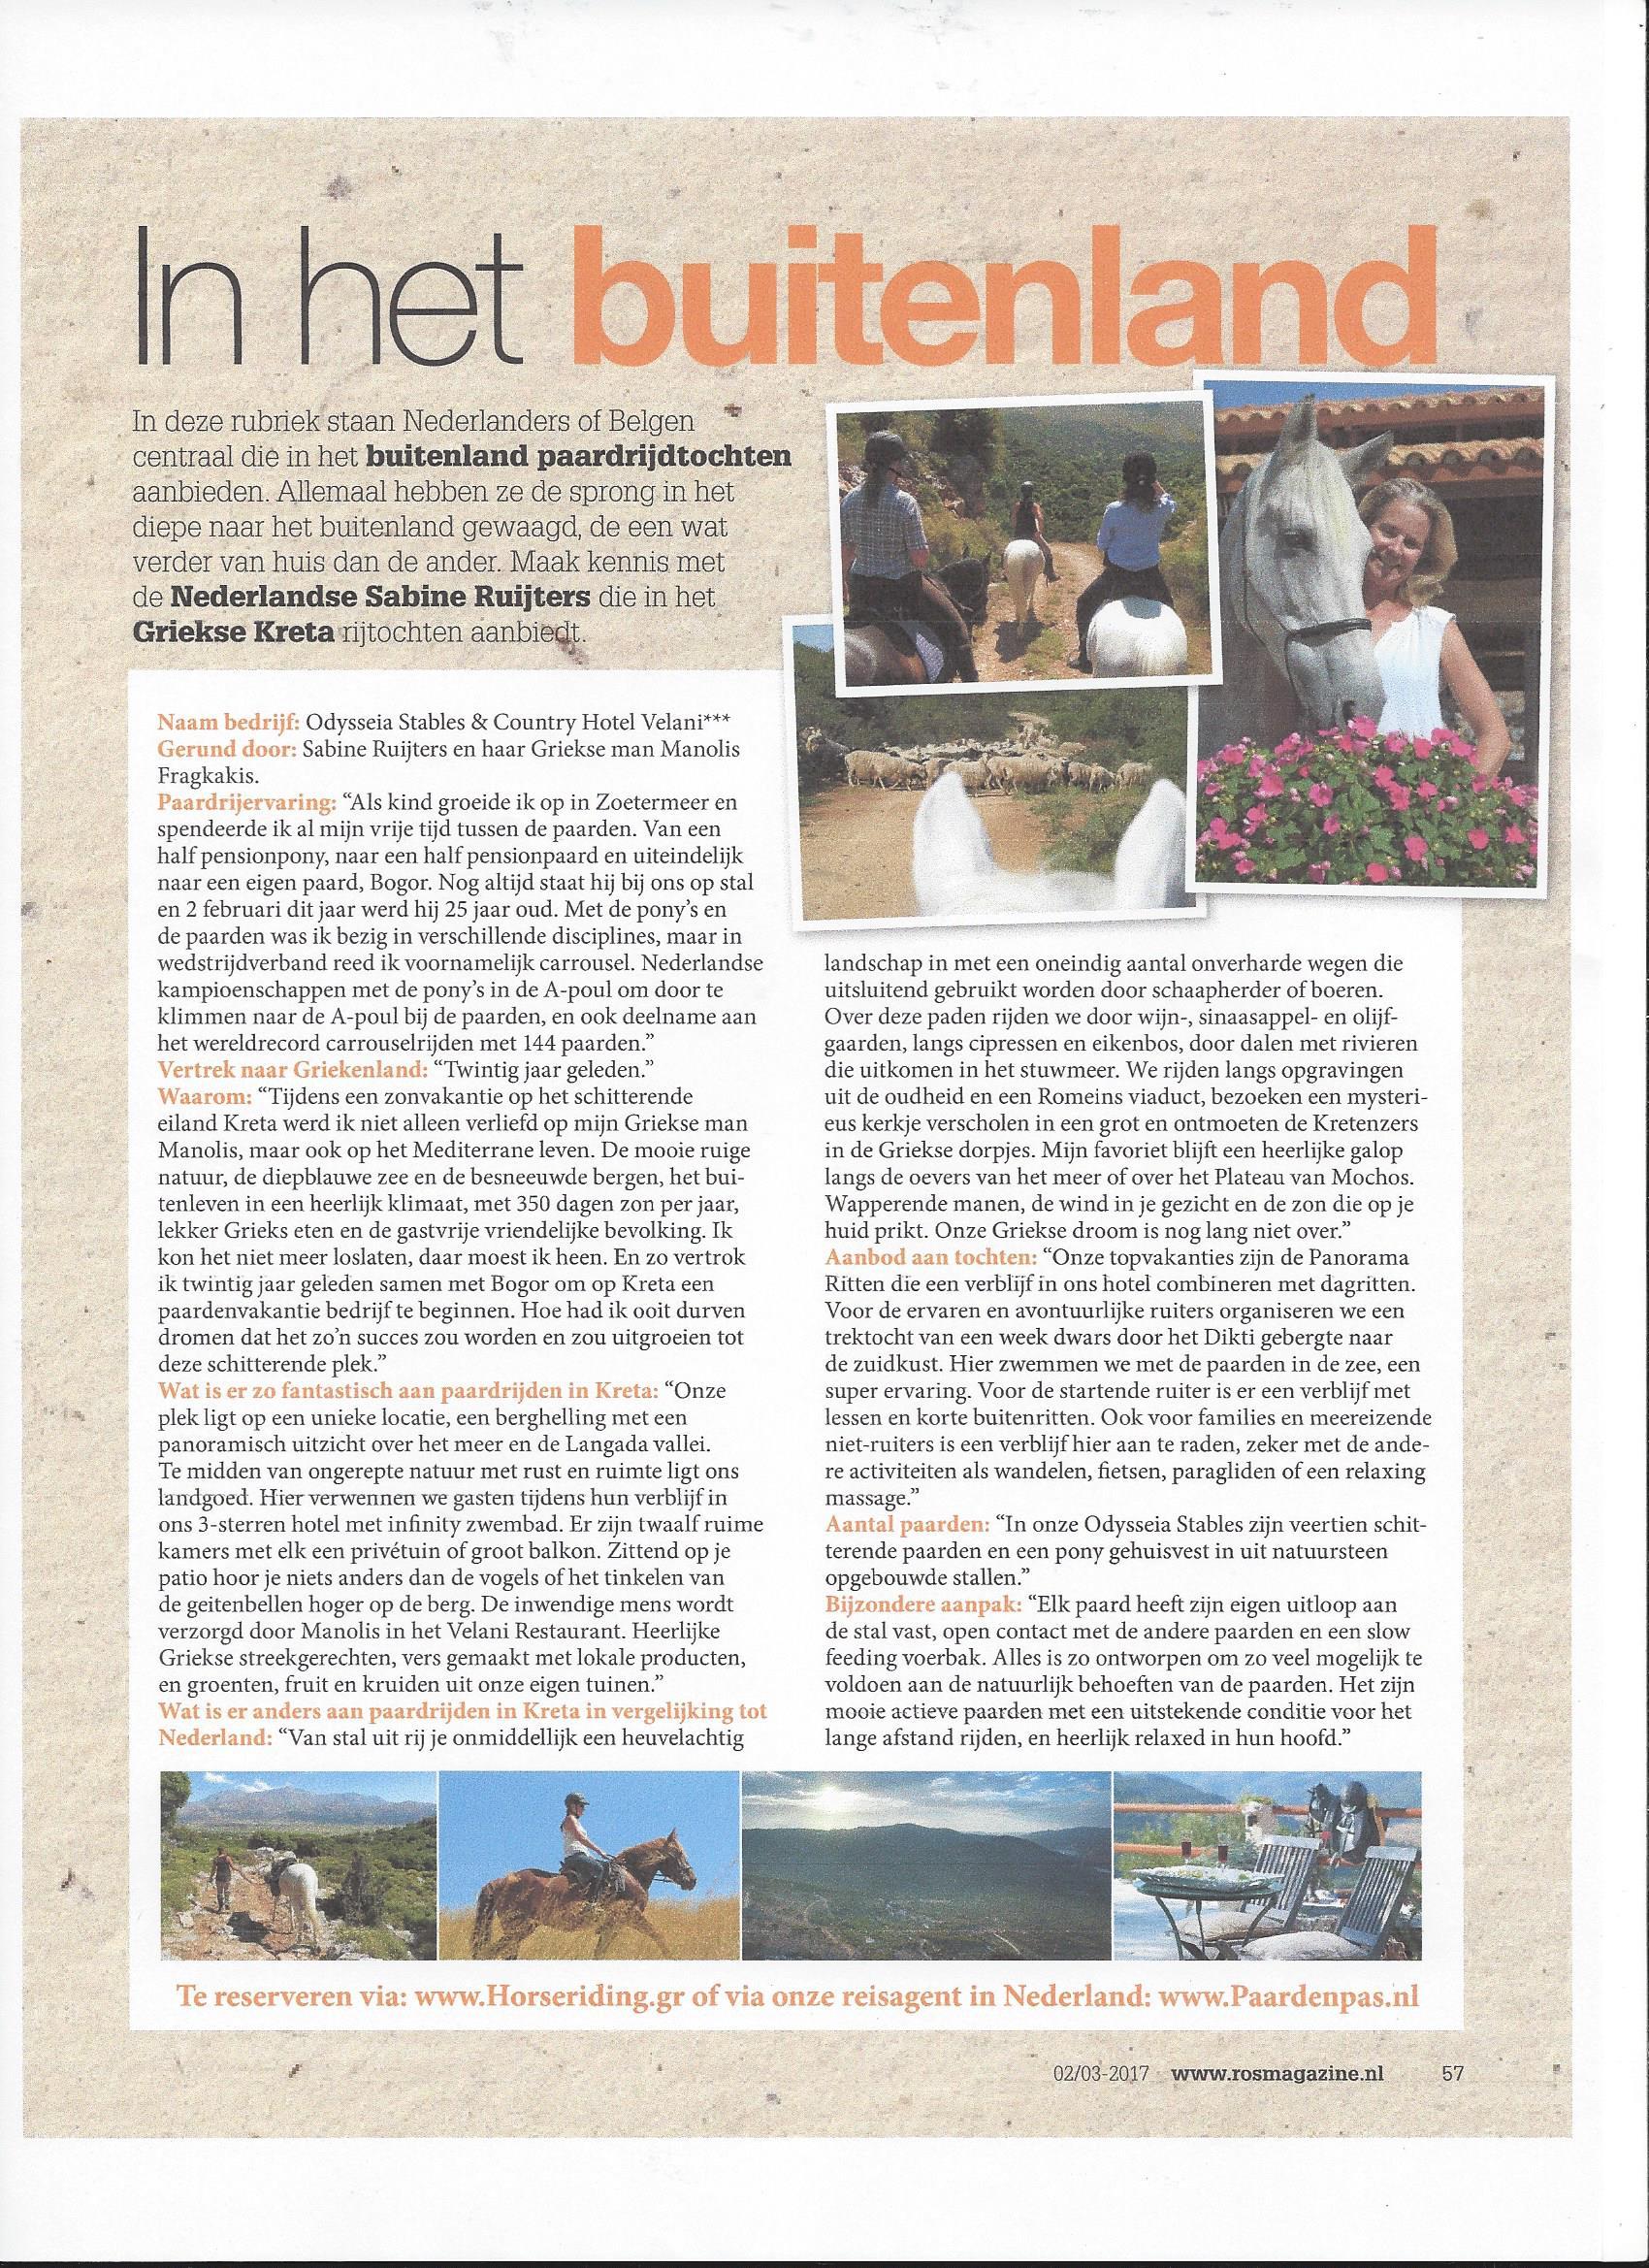 ROS Magazine - Kreta